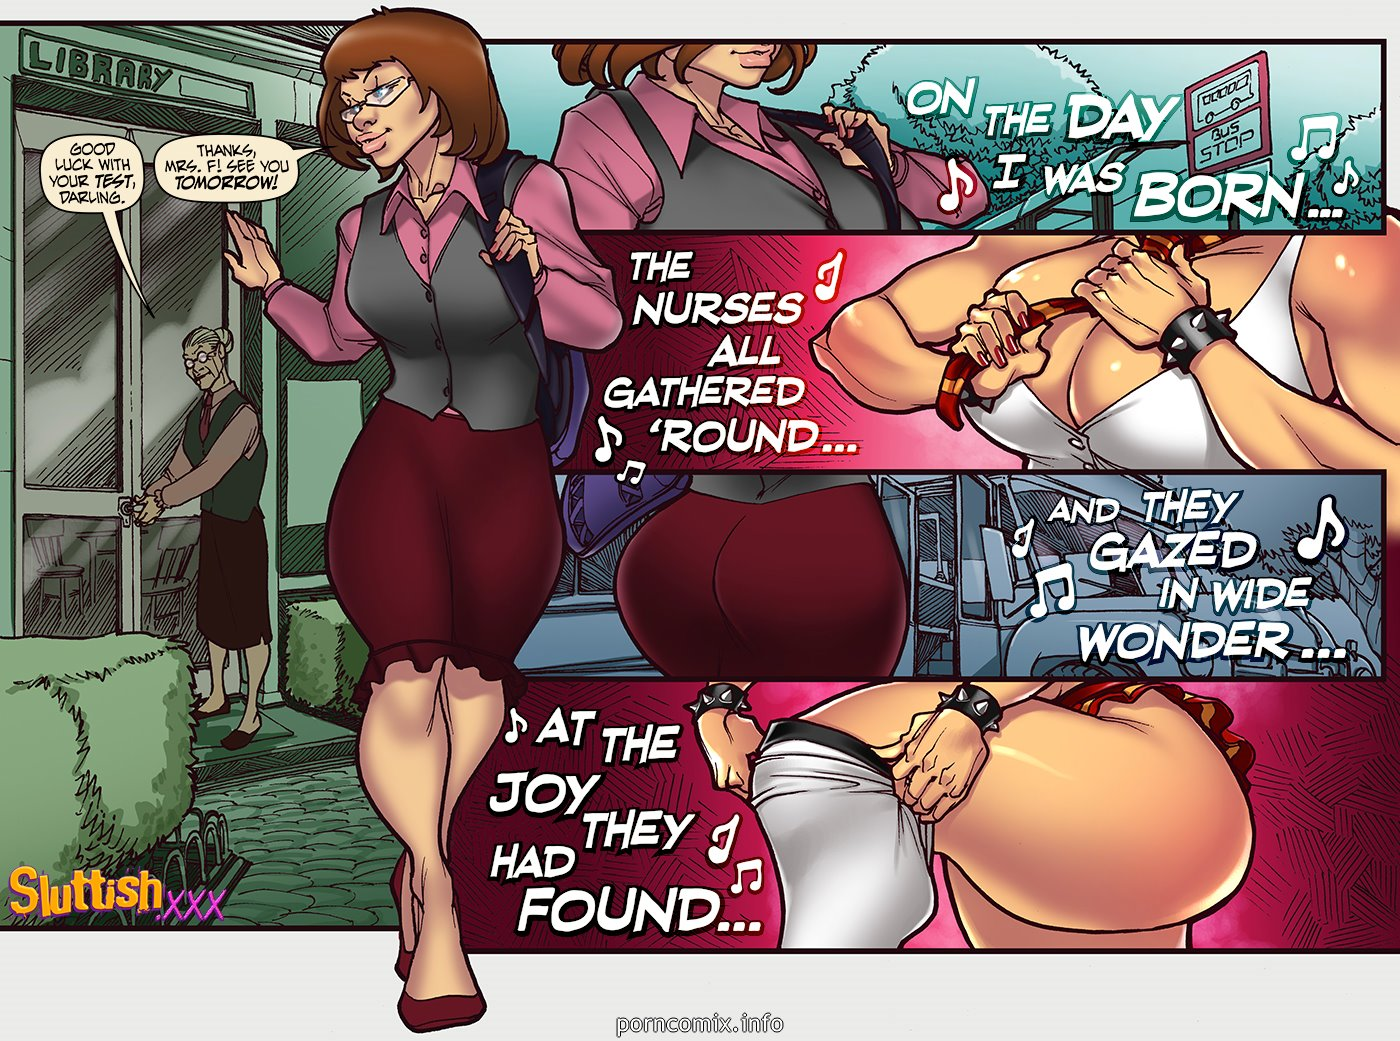 SluttishXXX - Ginnys Week Monday